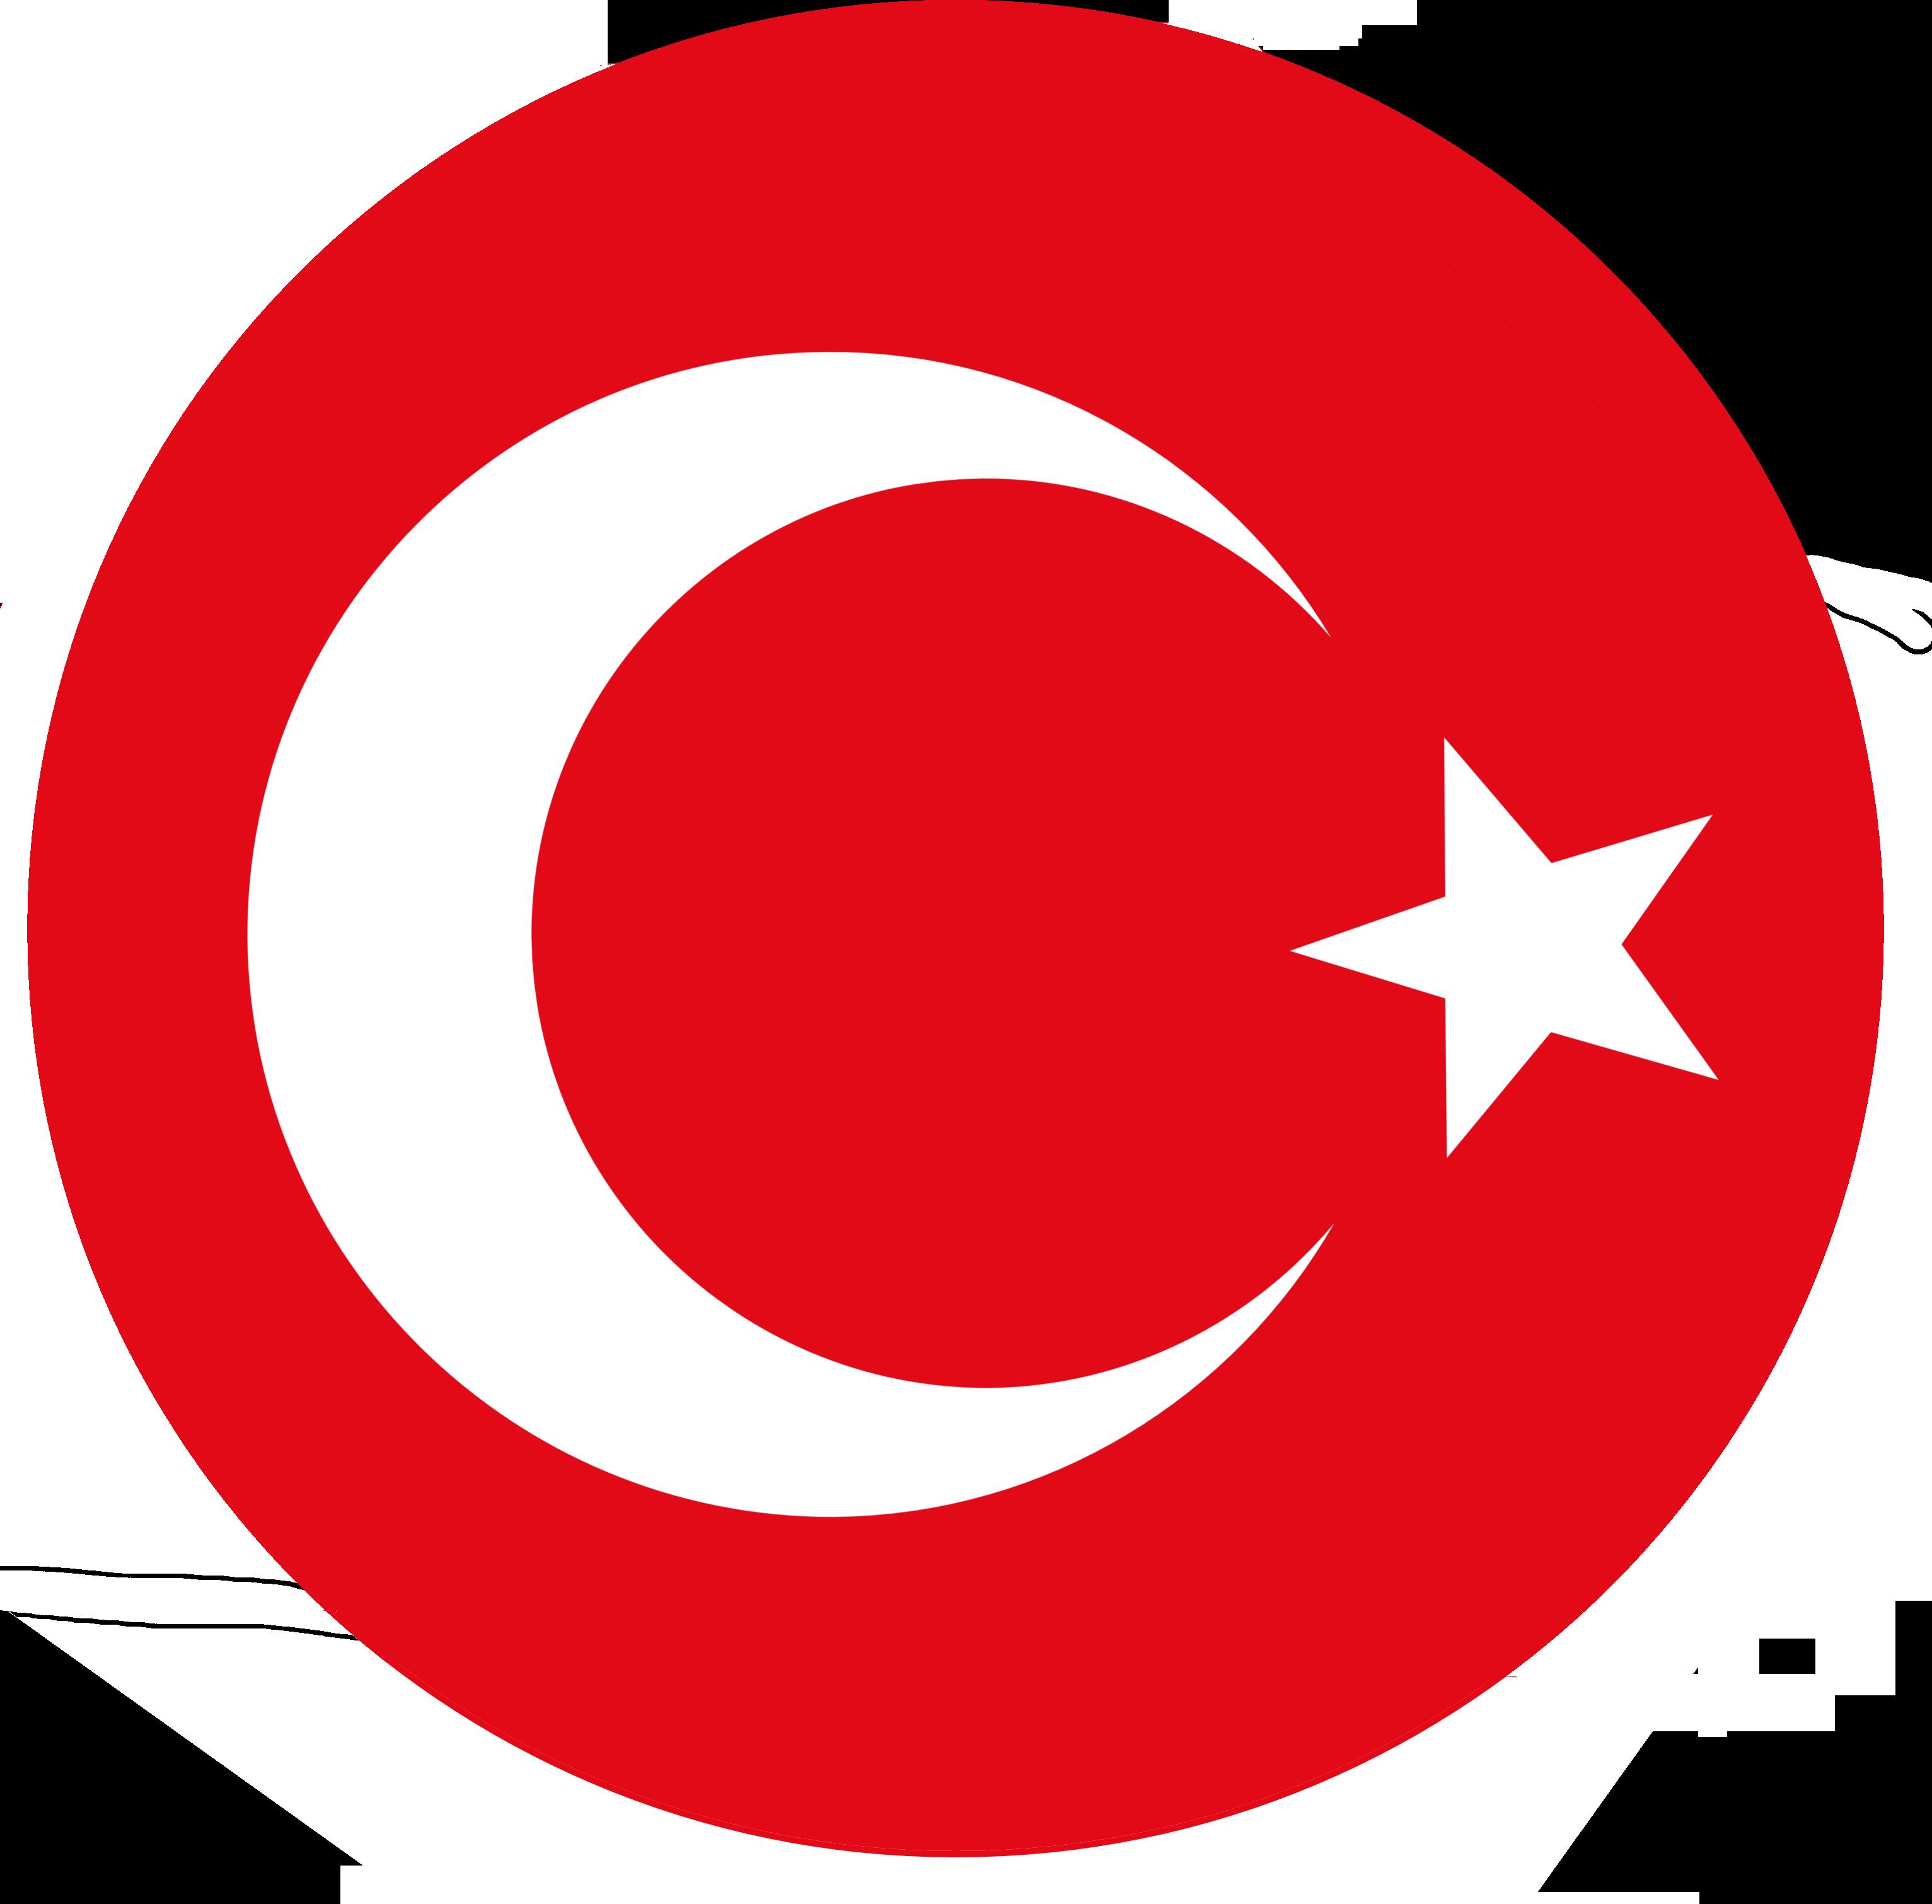 turkey national football team logos download